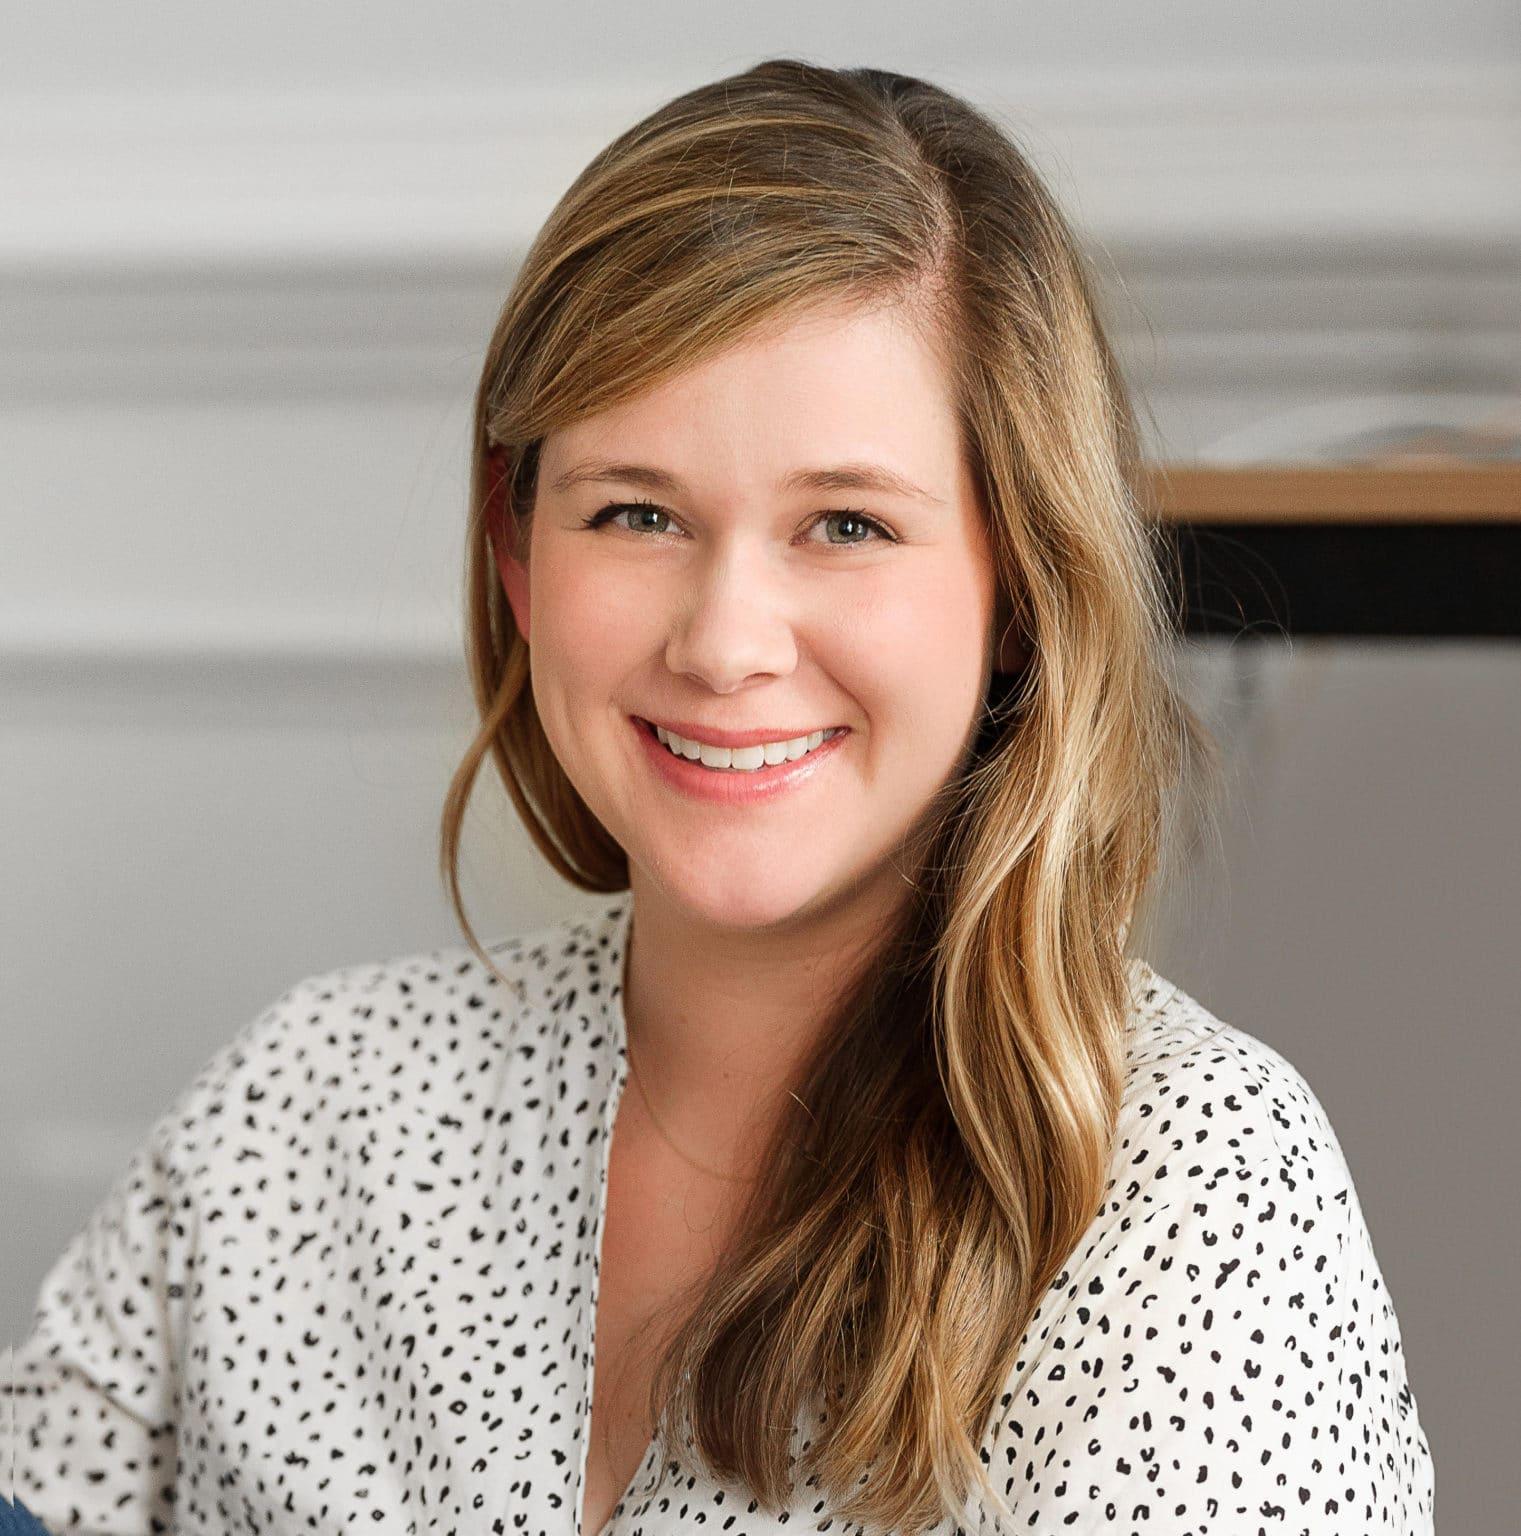 Case Study: Katie Lantukh